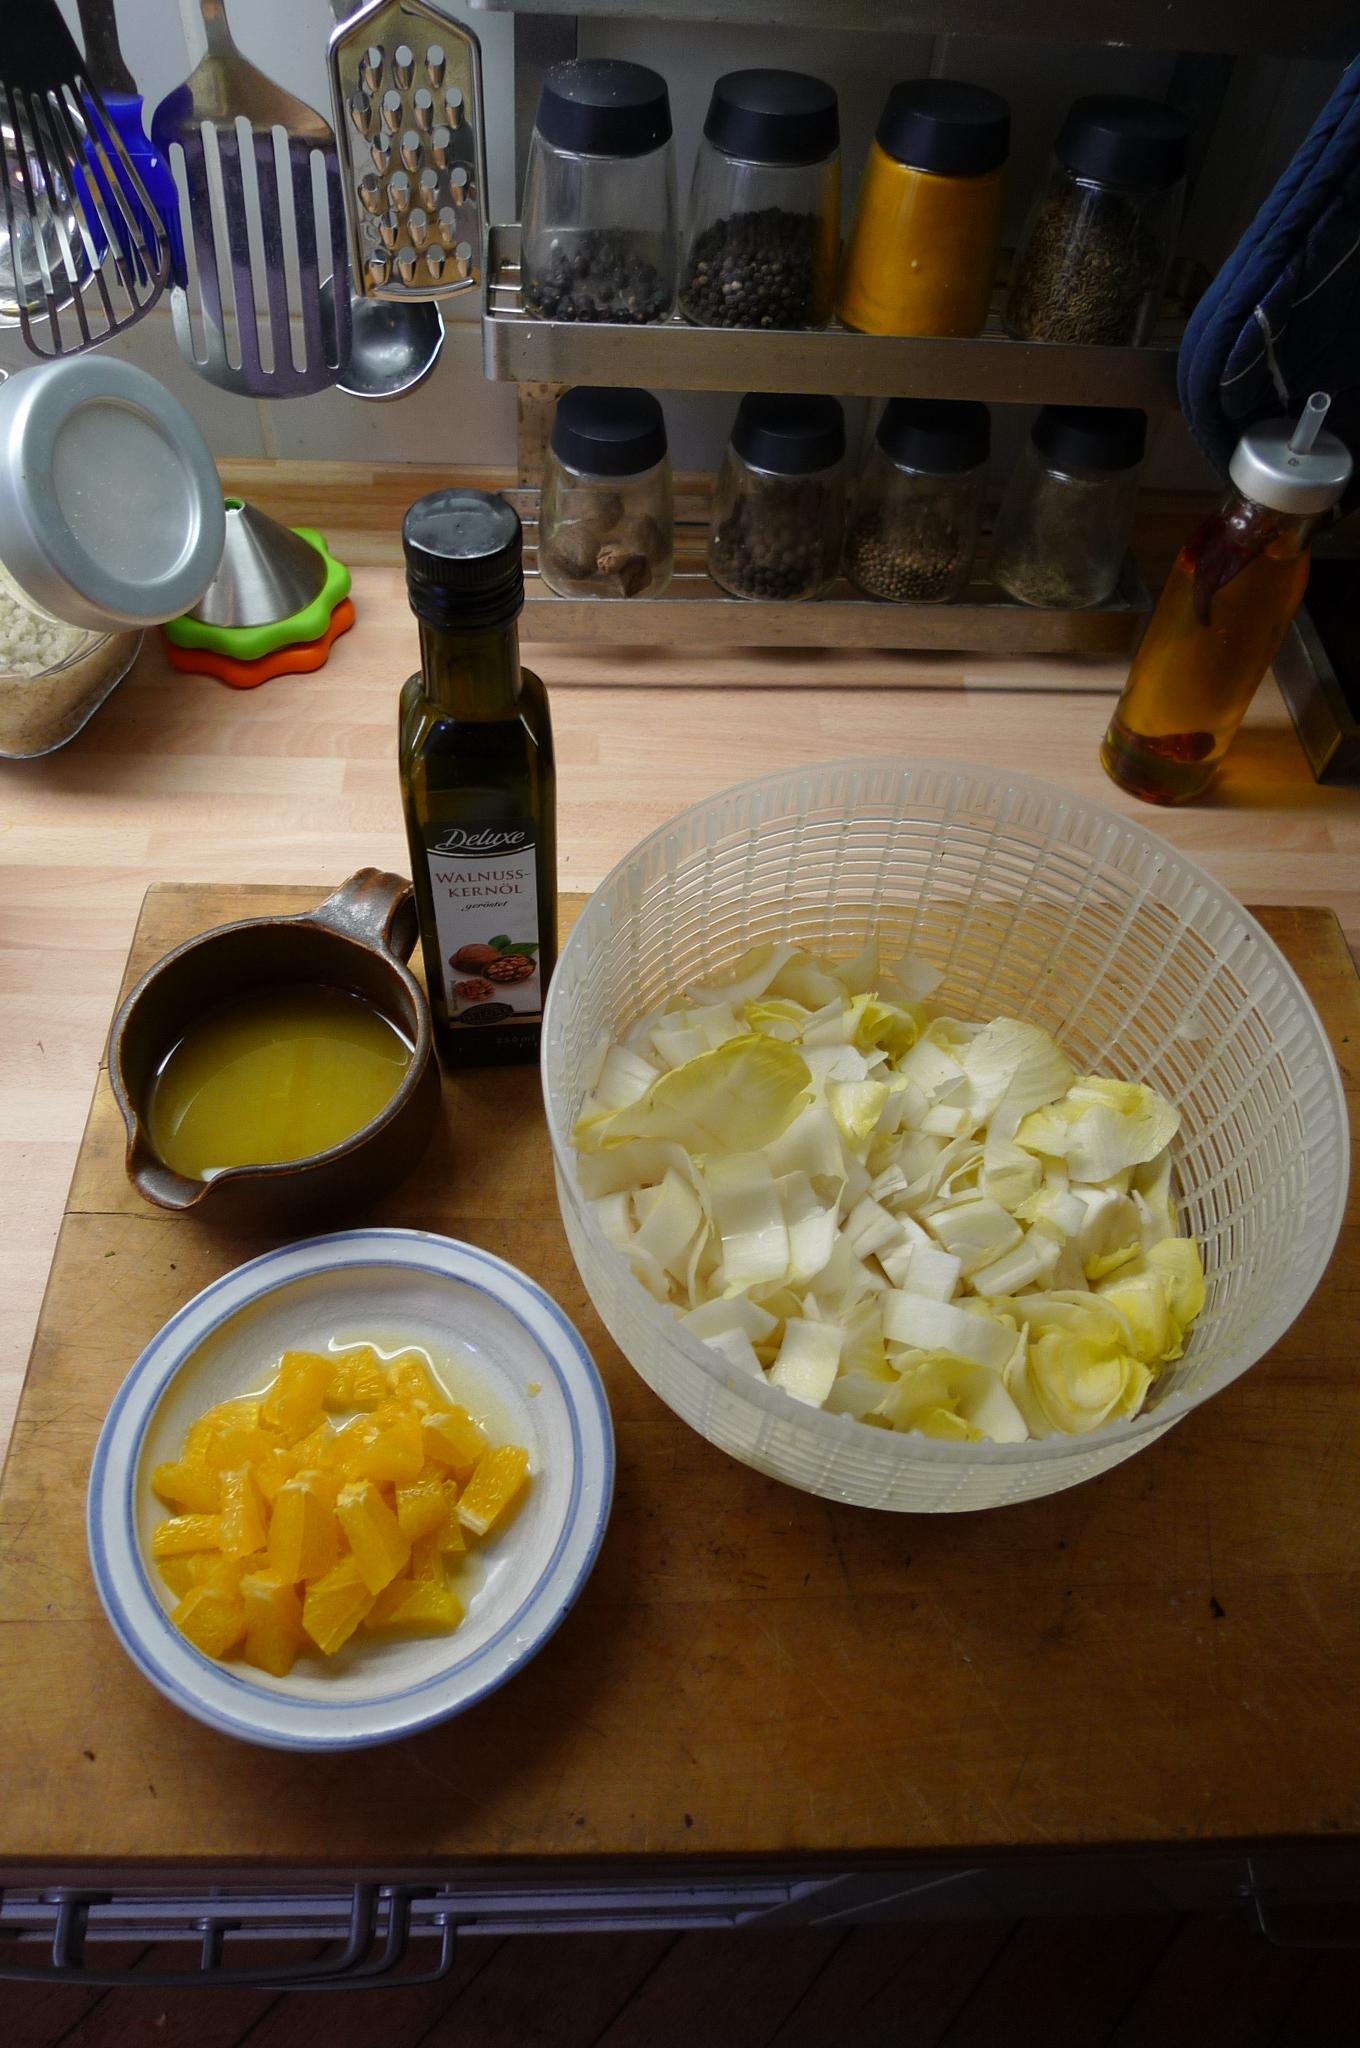 Kabeljau,Chicoreesalat,Kartoffeln,Quarkspeise - 17.2.15   (5)